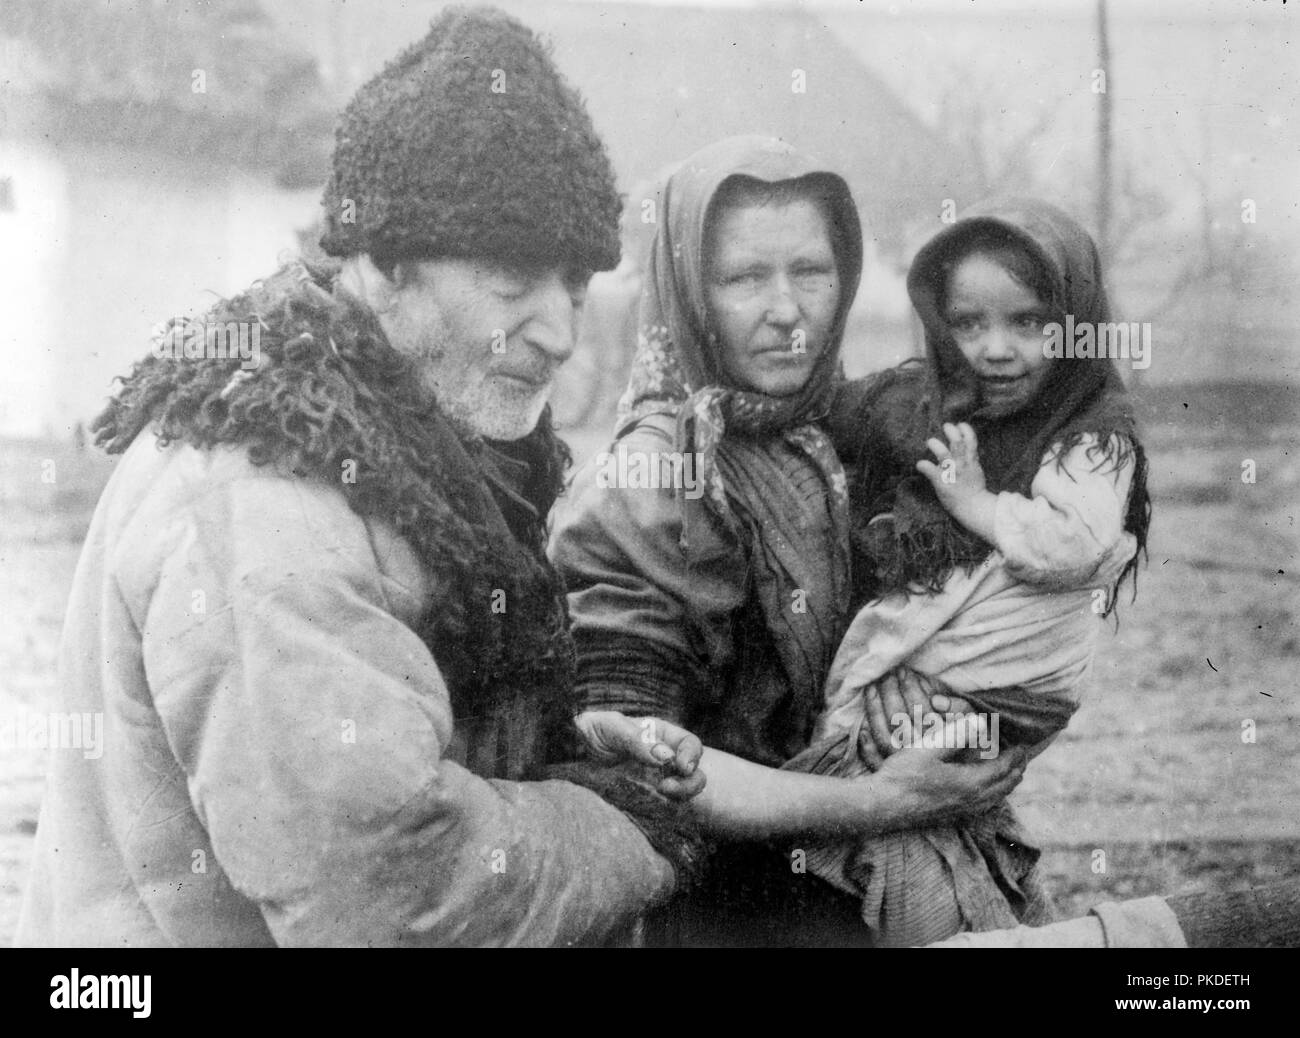 Polish peasant refugees. Polish man, woman and child during World War I - Stock Image